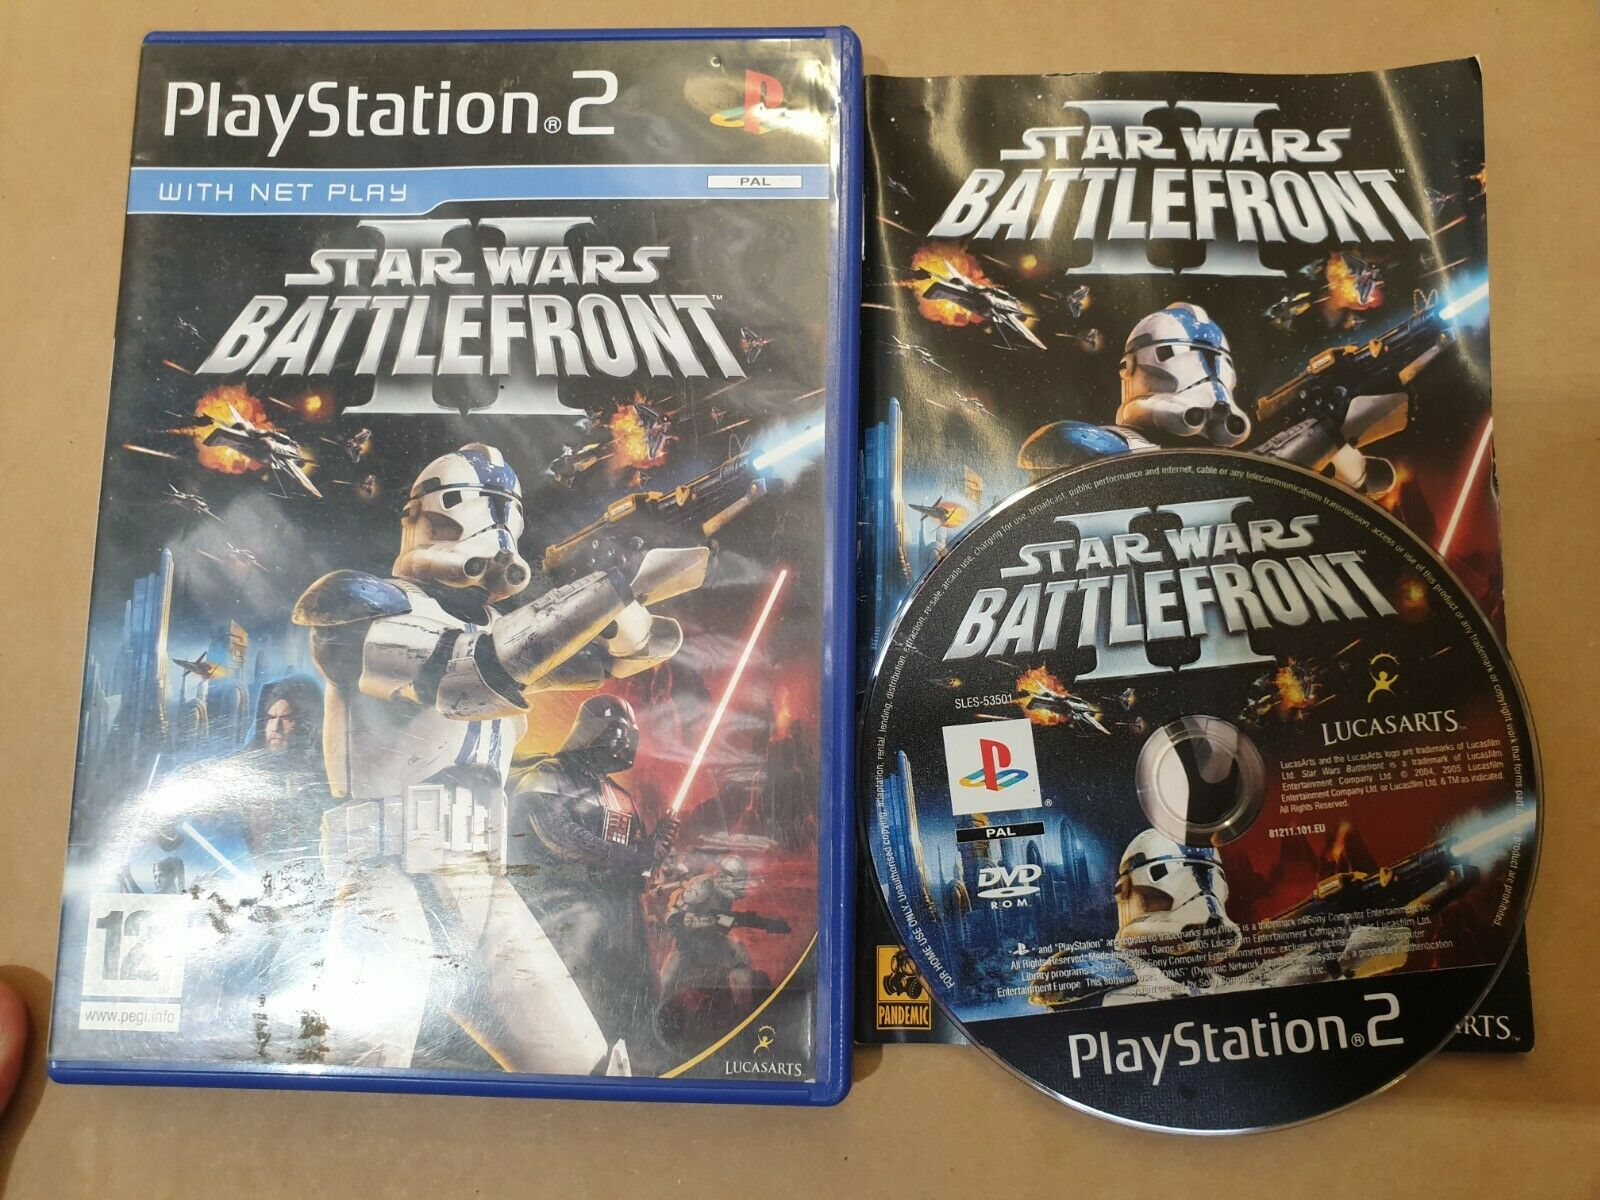 STAR WARS BATTLEFRONT 2 PS2 PLAYSTATION 2 - Avis StarWars